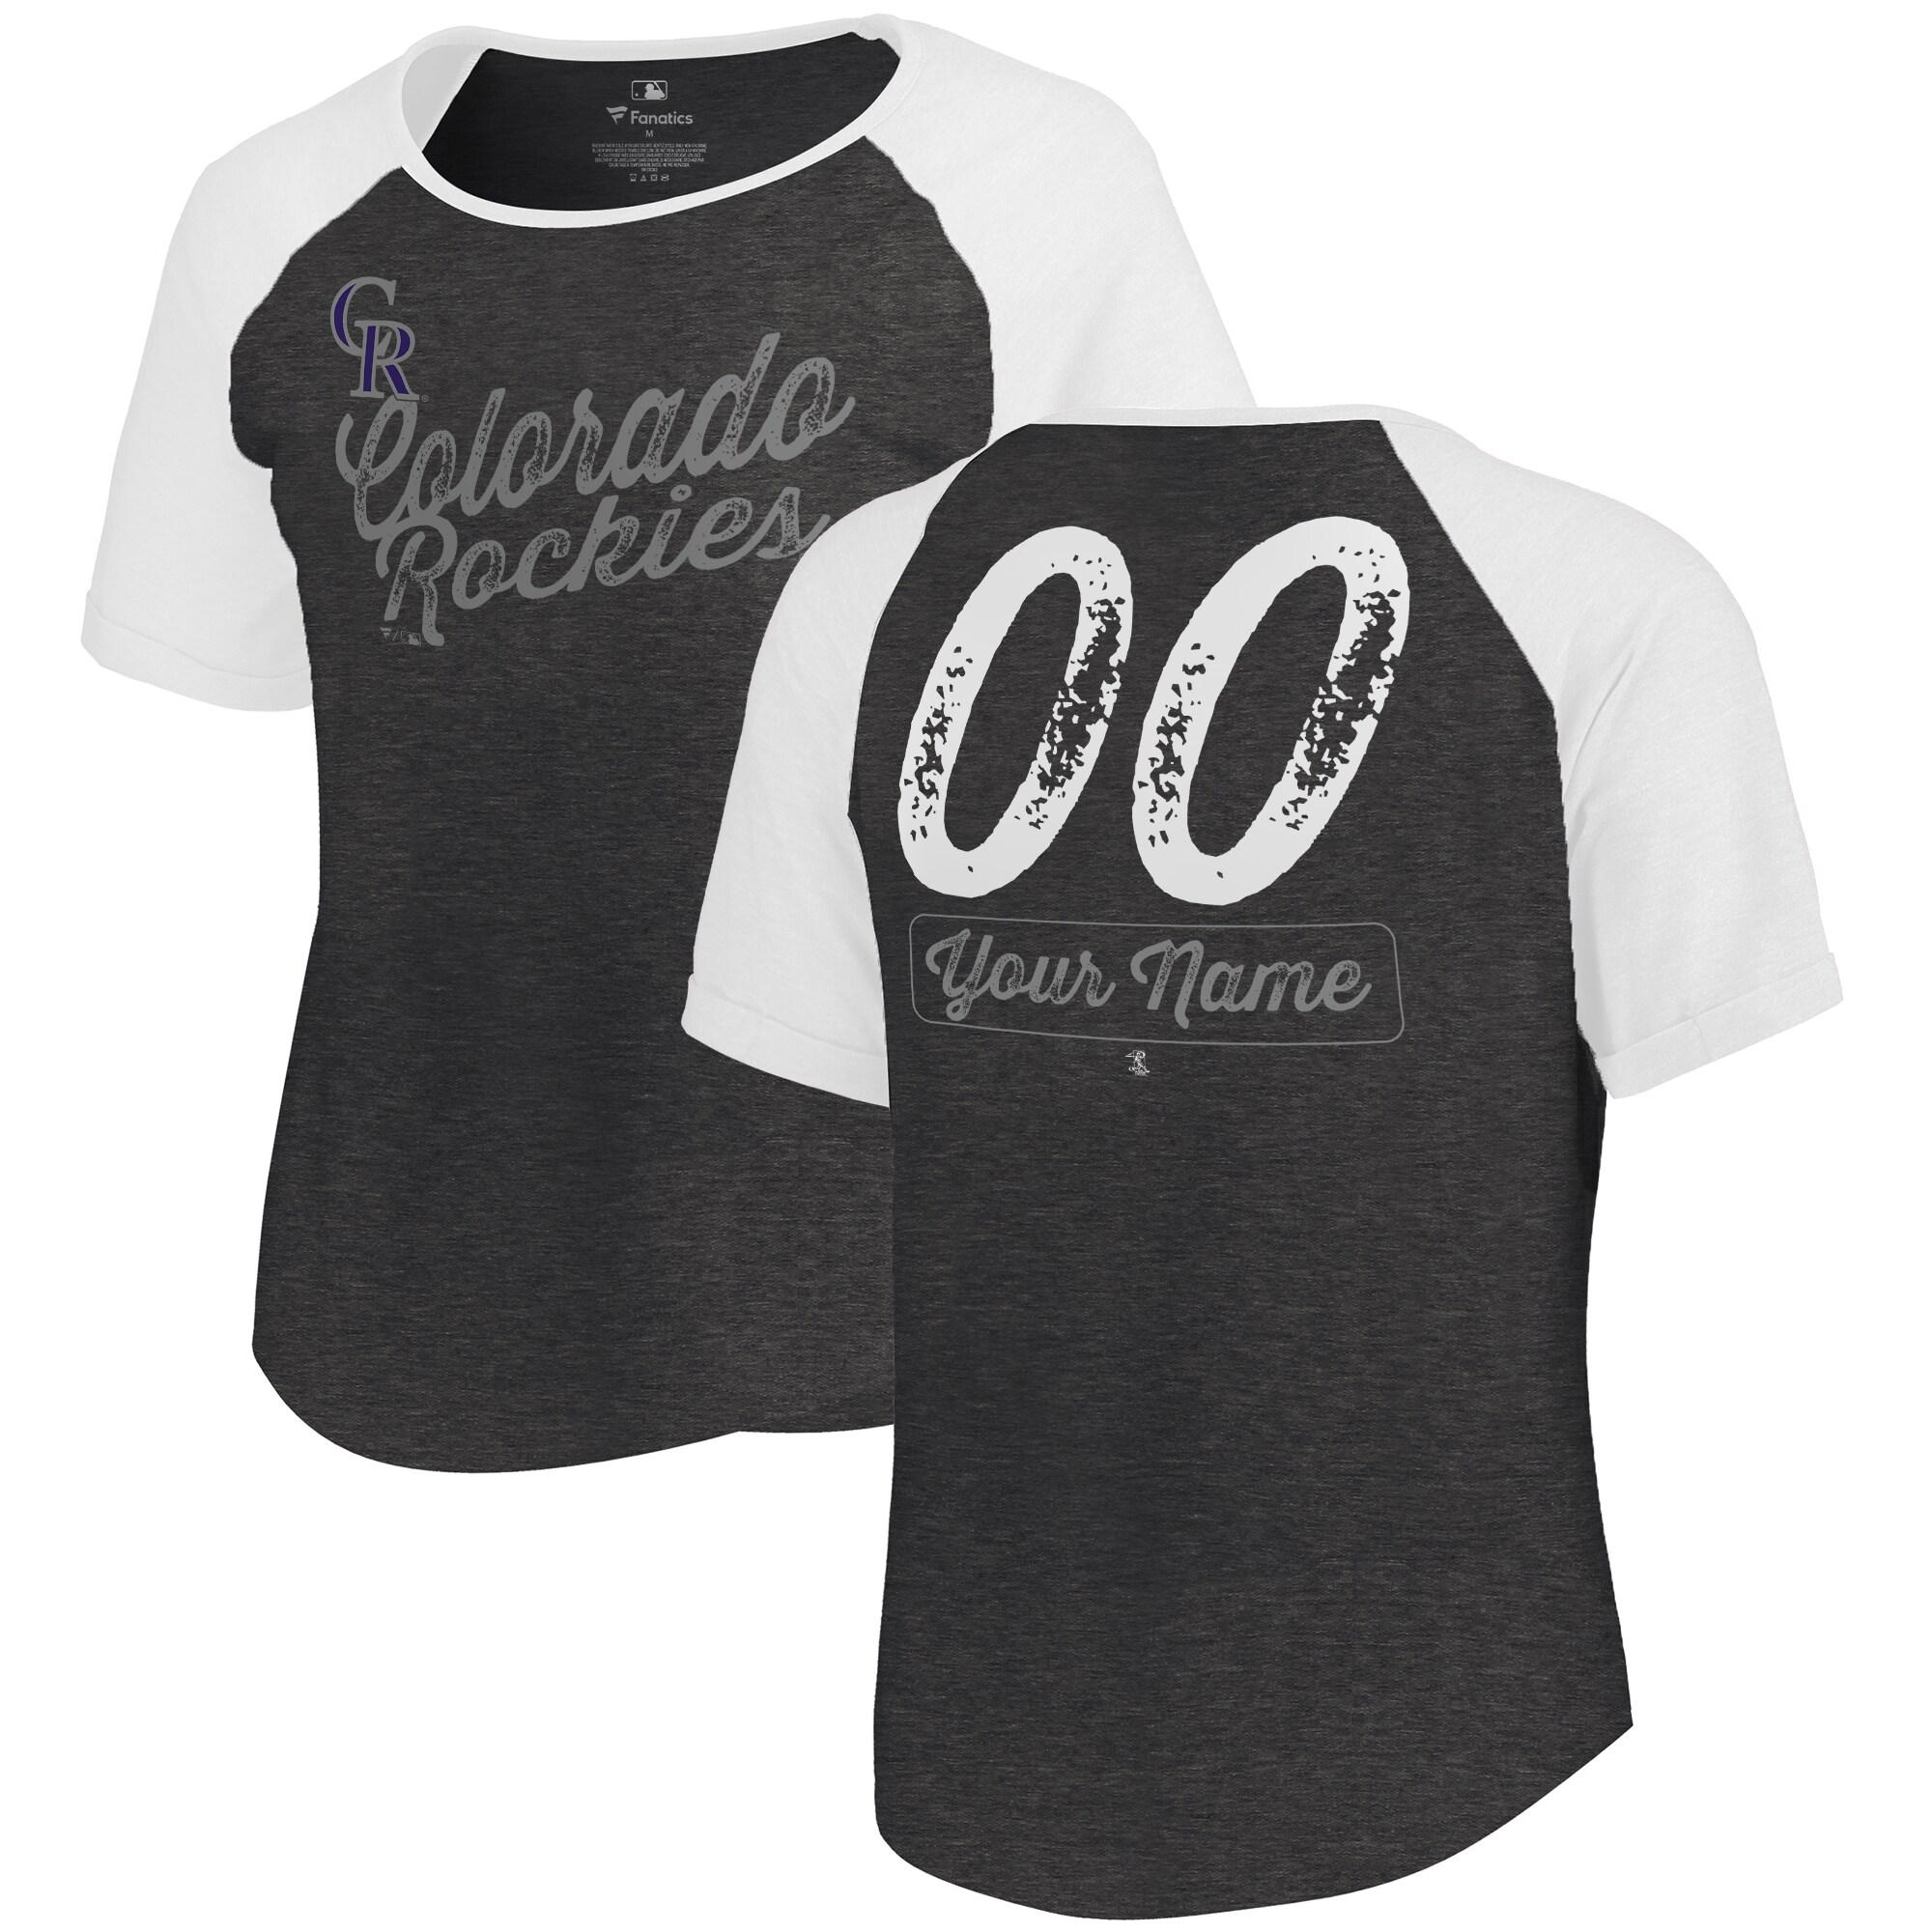 Colorado Rockies Fanatics Branded Women's Personalized Sideline Tri-Blend T-Shirt - Black